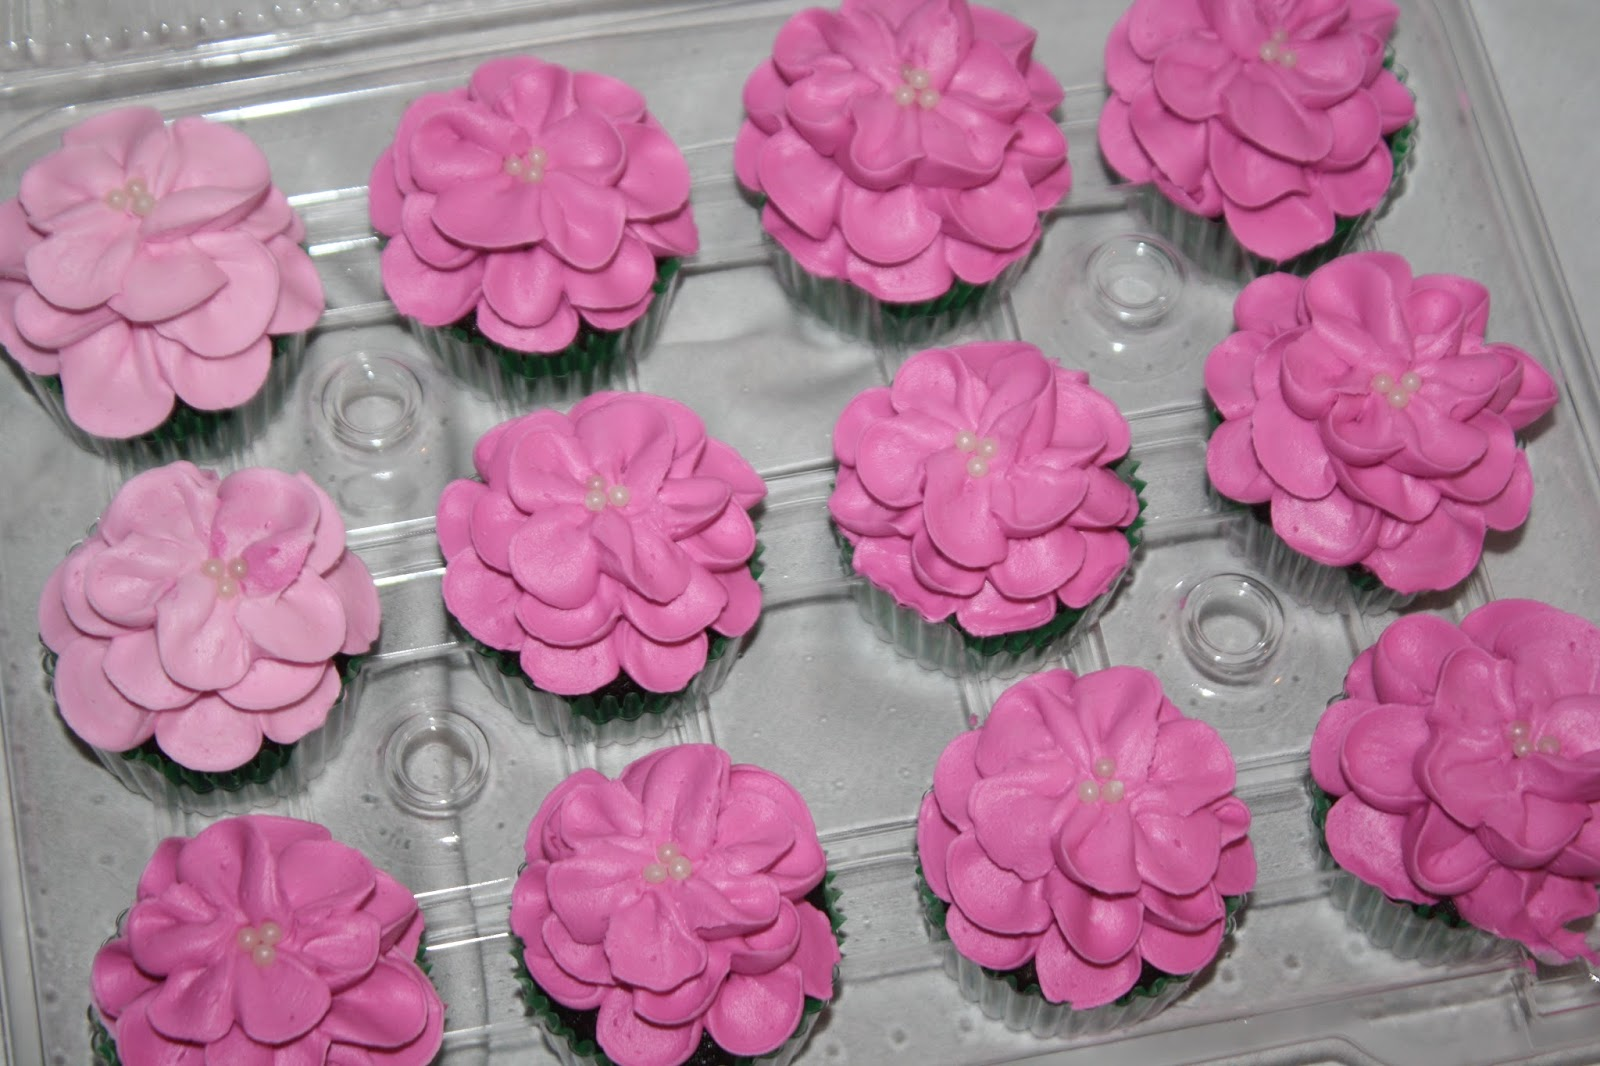 Hock Cakes Llc Pink Flower Cupcakes